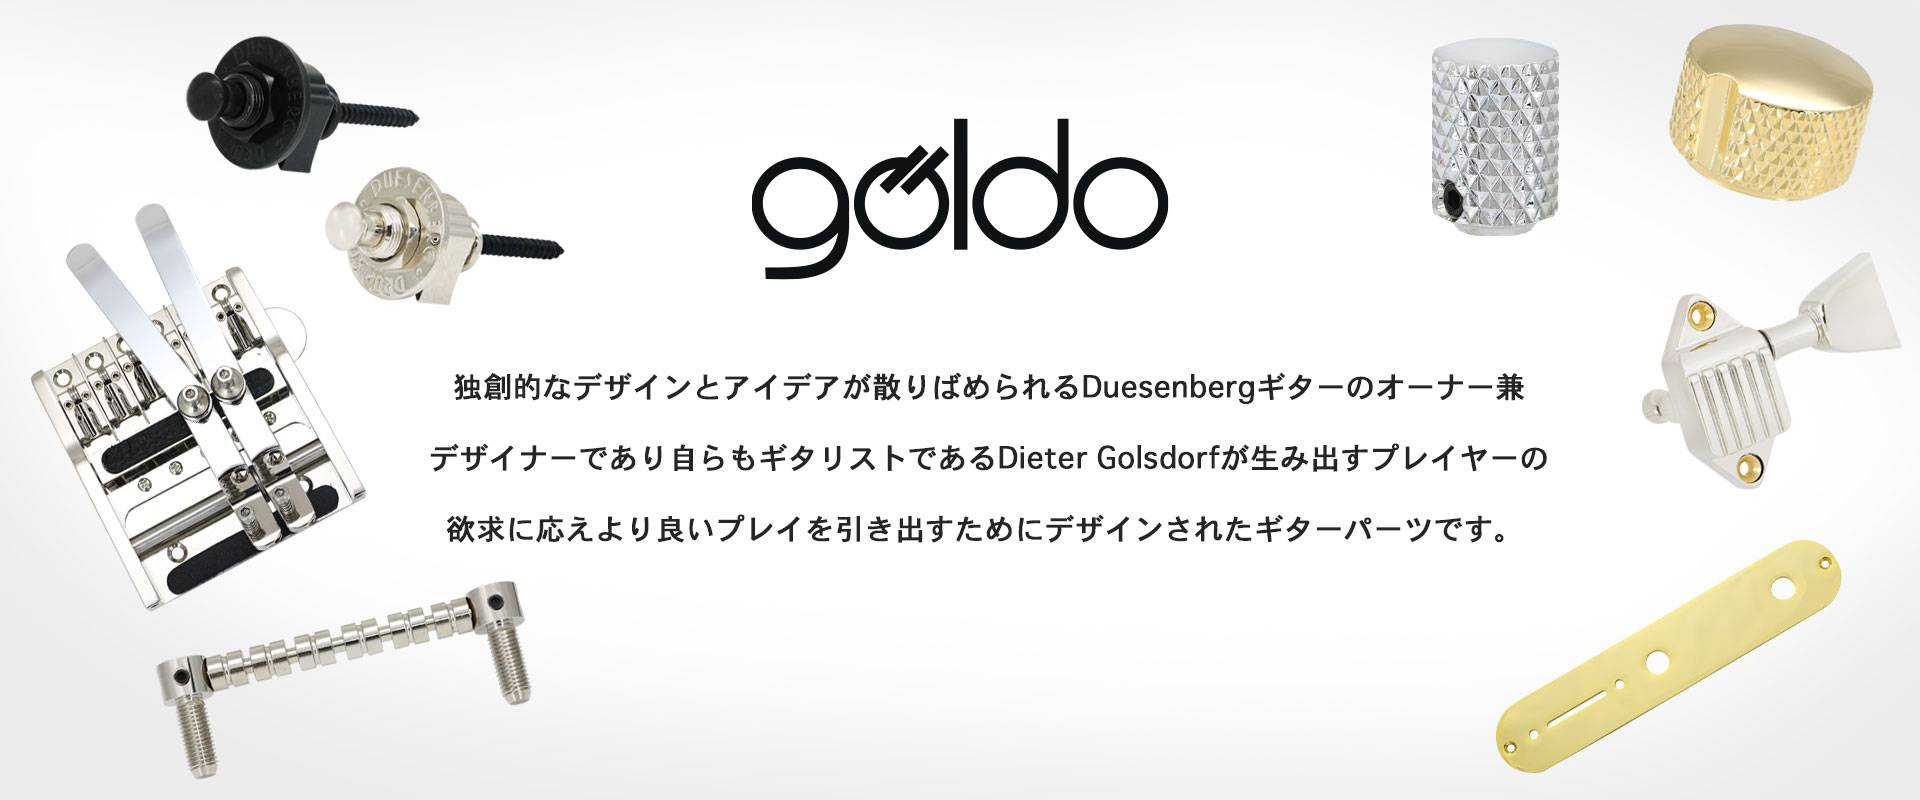 Goldo